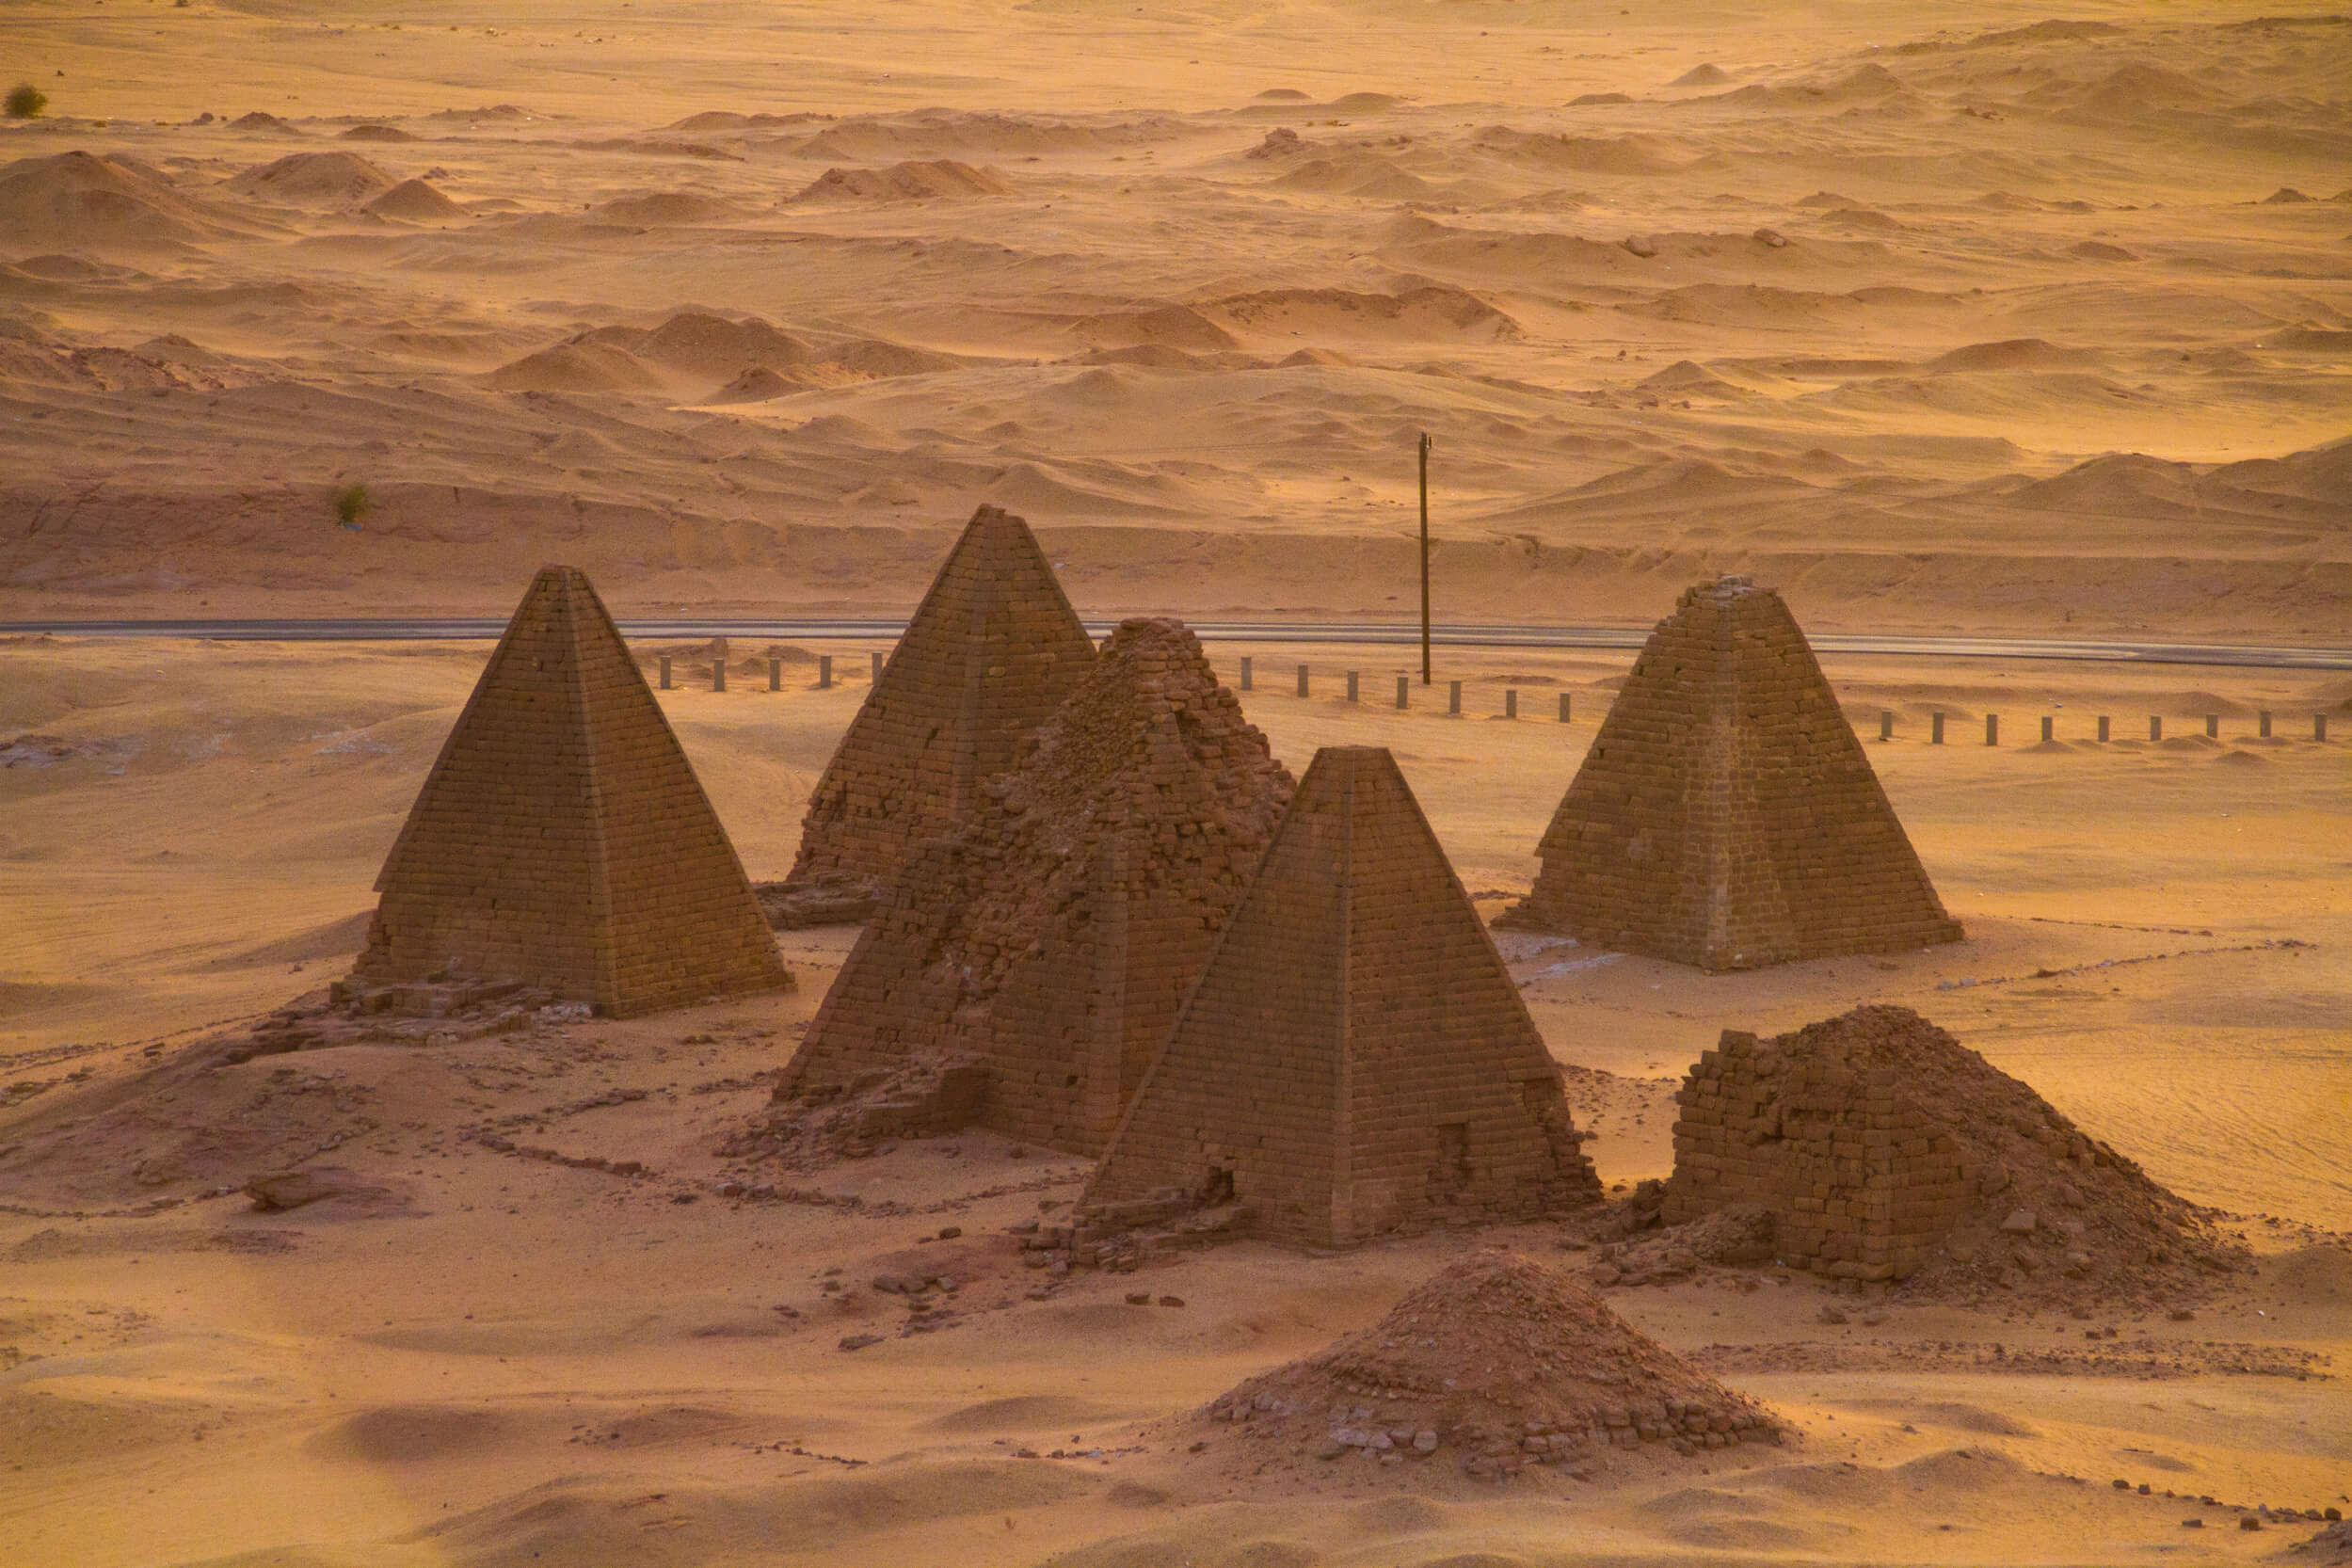 https://bubo.sk/uploads/galleries/7407/marekmeluch_sudan_jebelbarkalpyramids.jpg